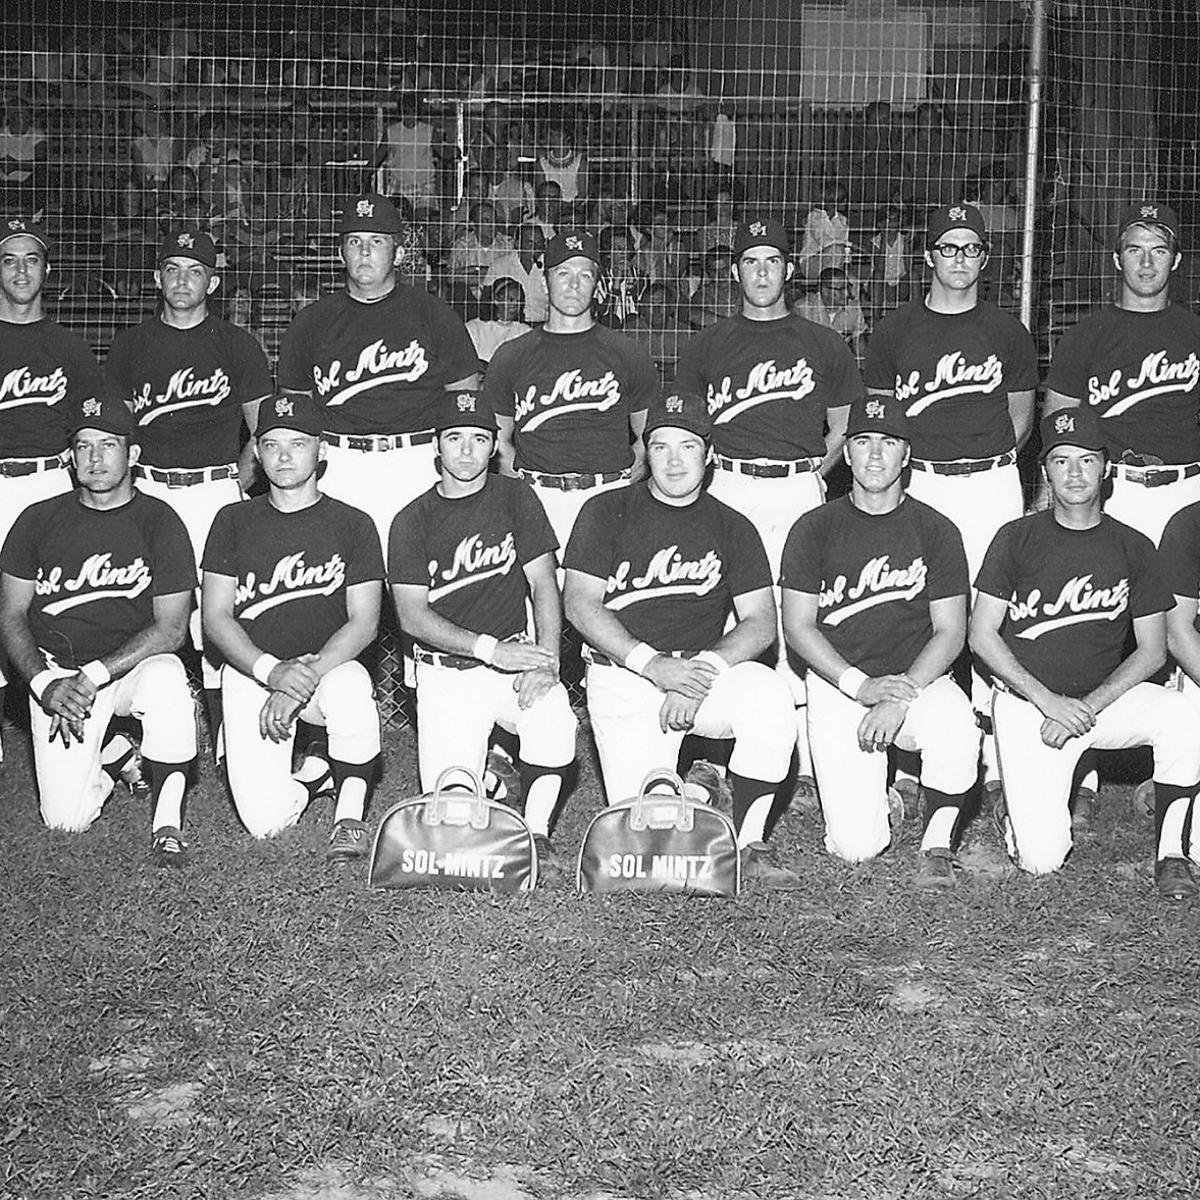 Area produced world-class softball players, teams | Bill